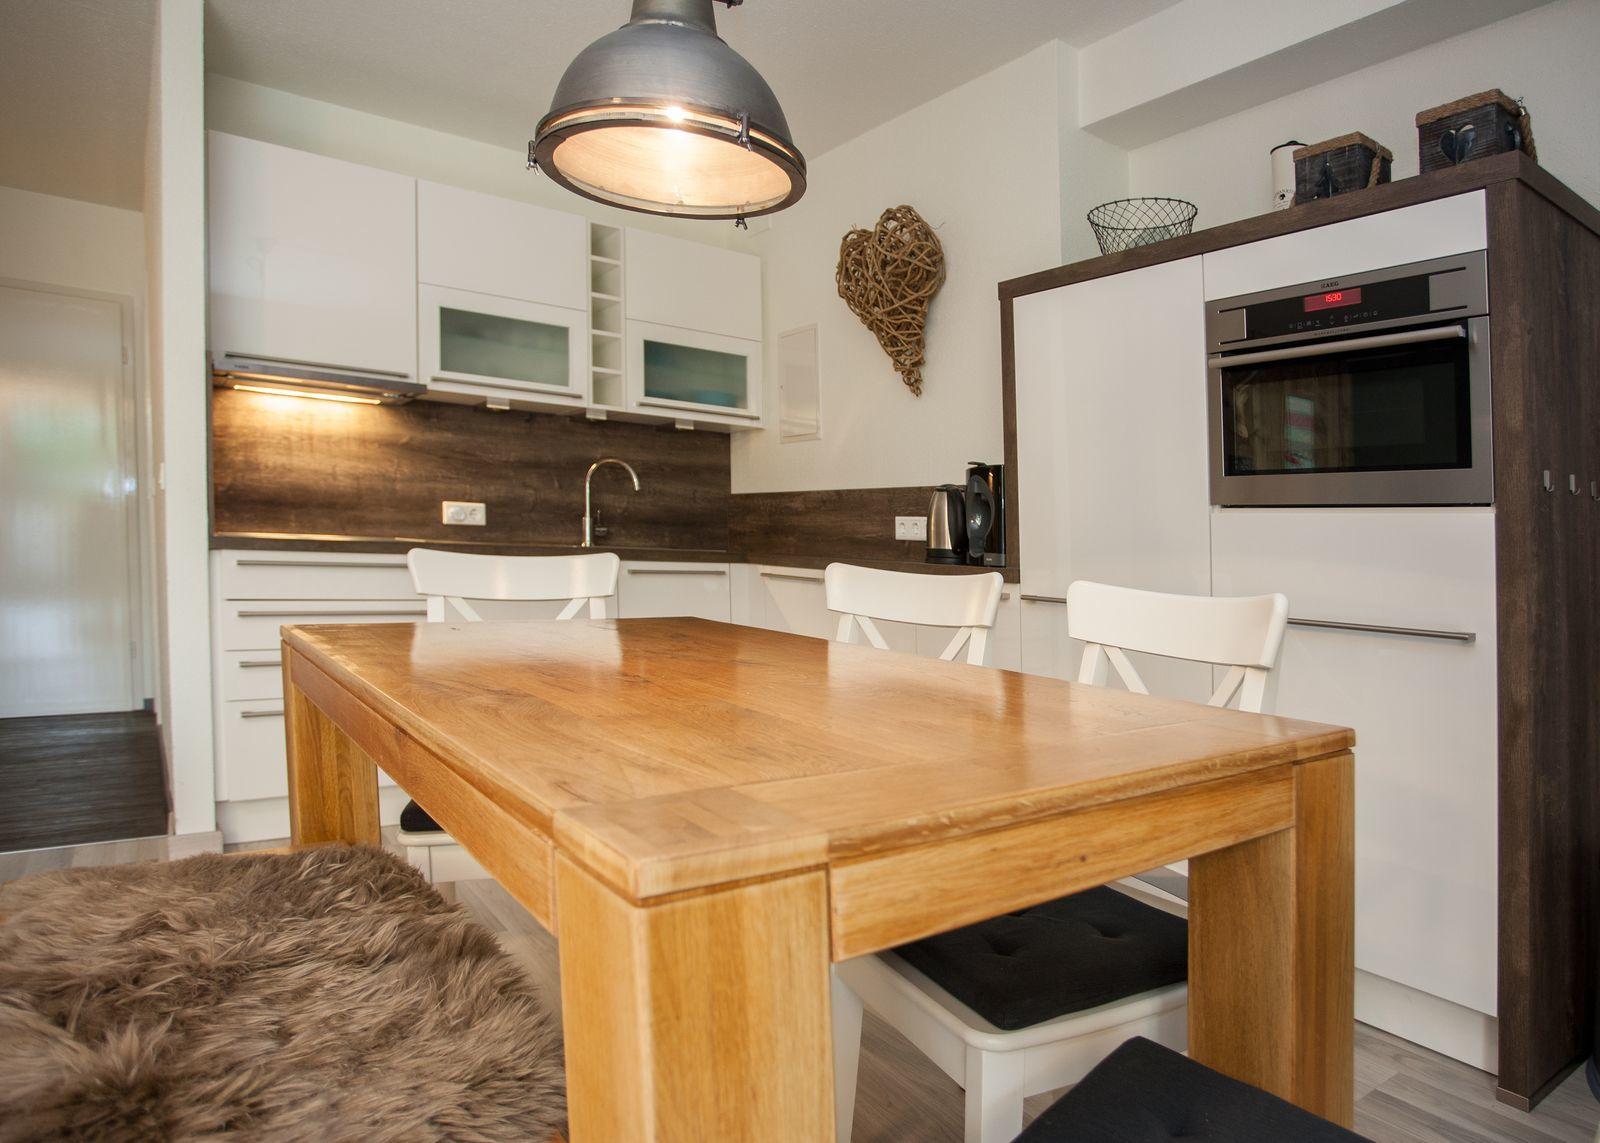 Apartment - Am Waltenberg 70-BO